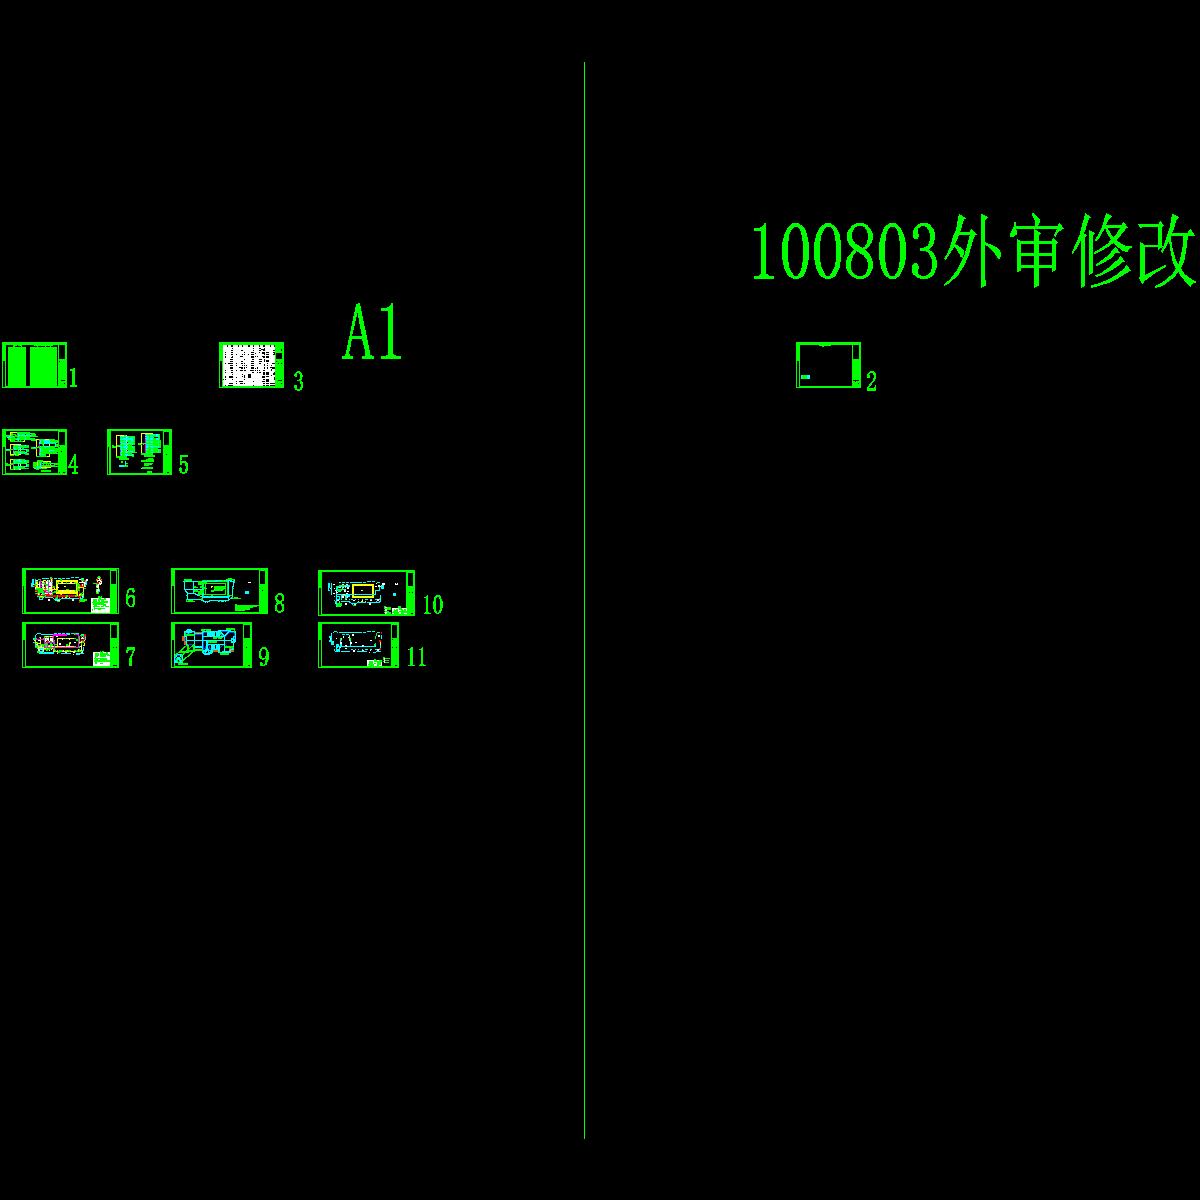 d1-江龙01#商业 100718.dwg